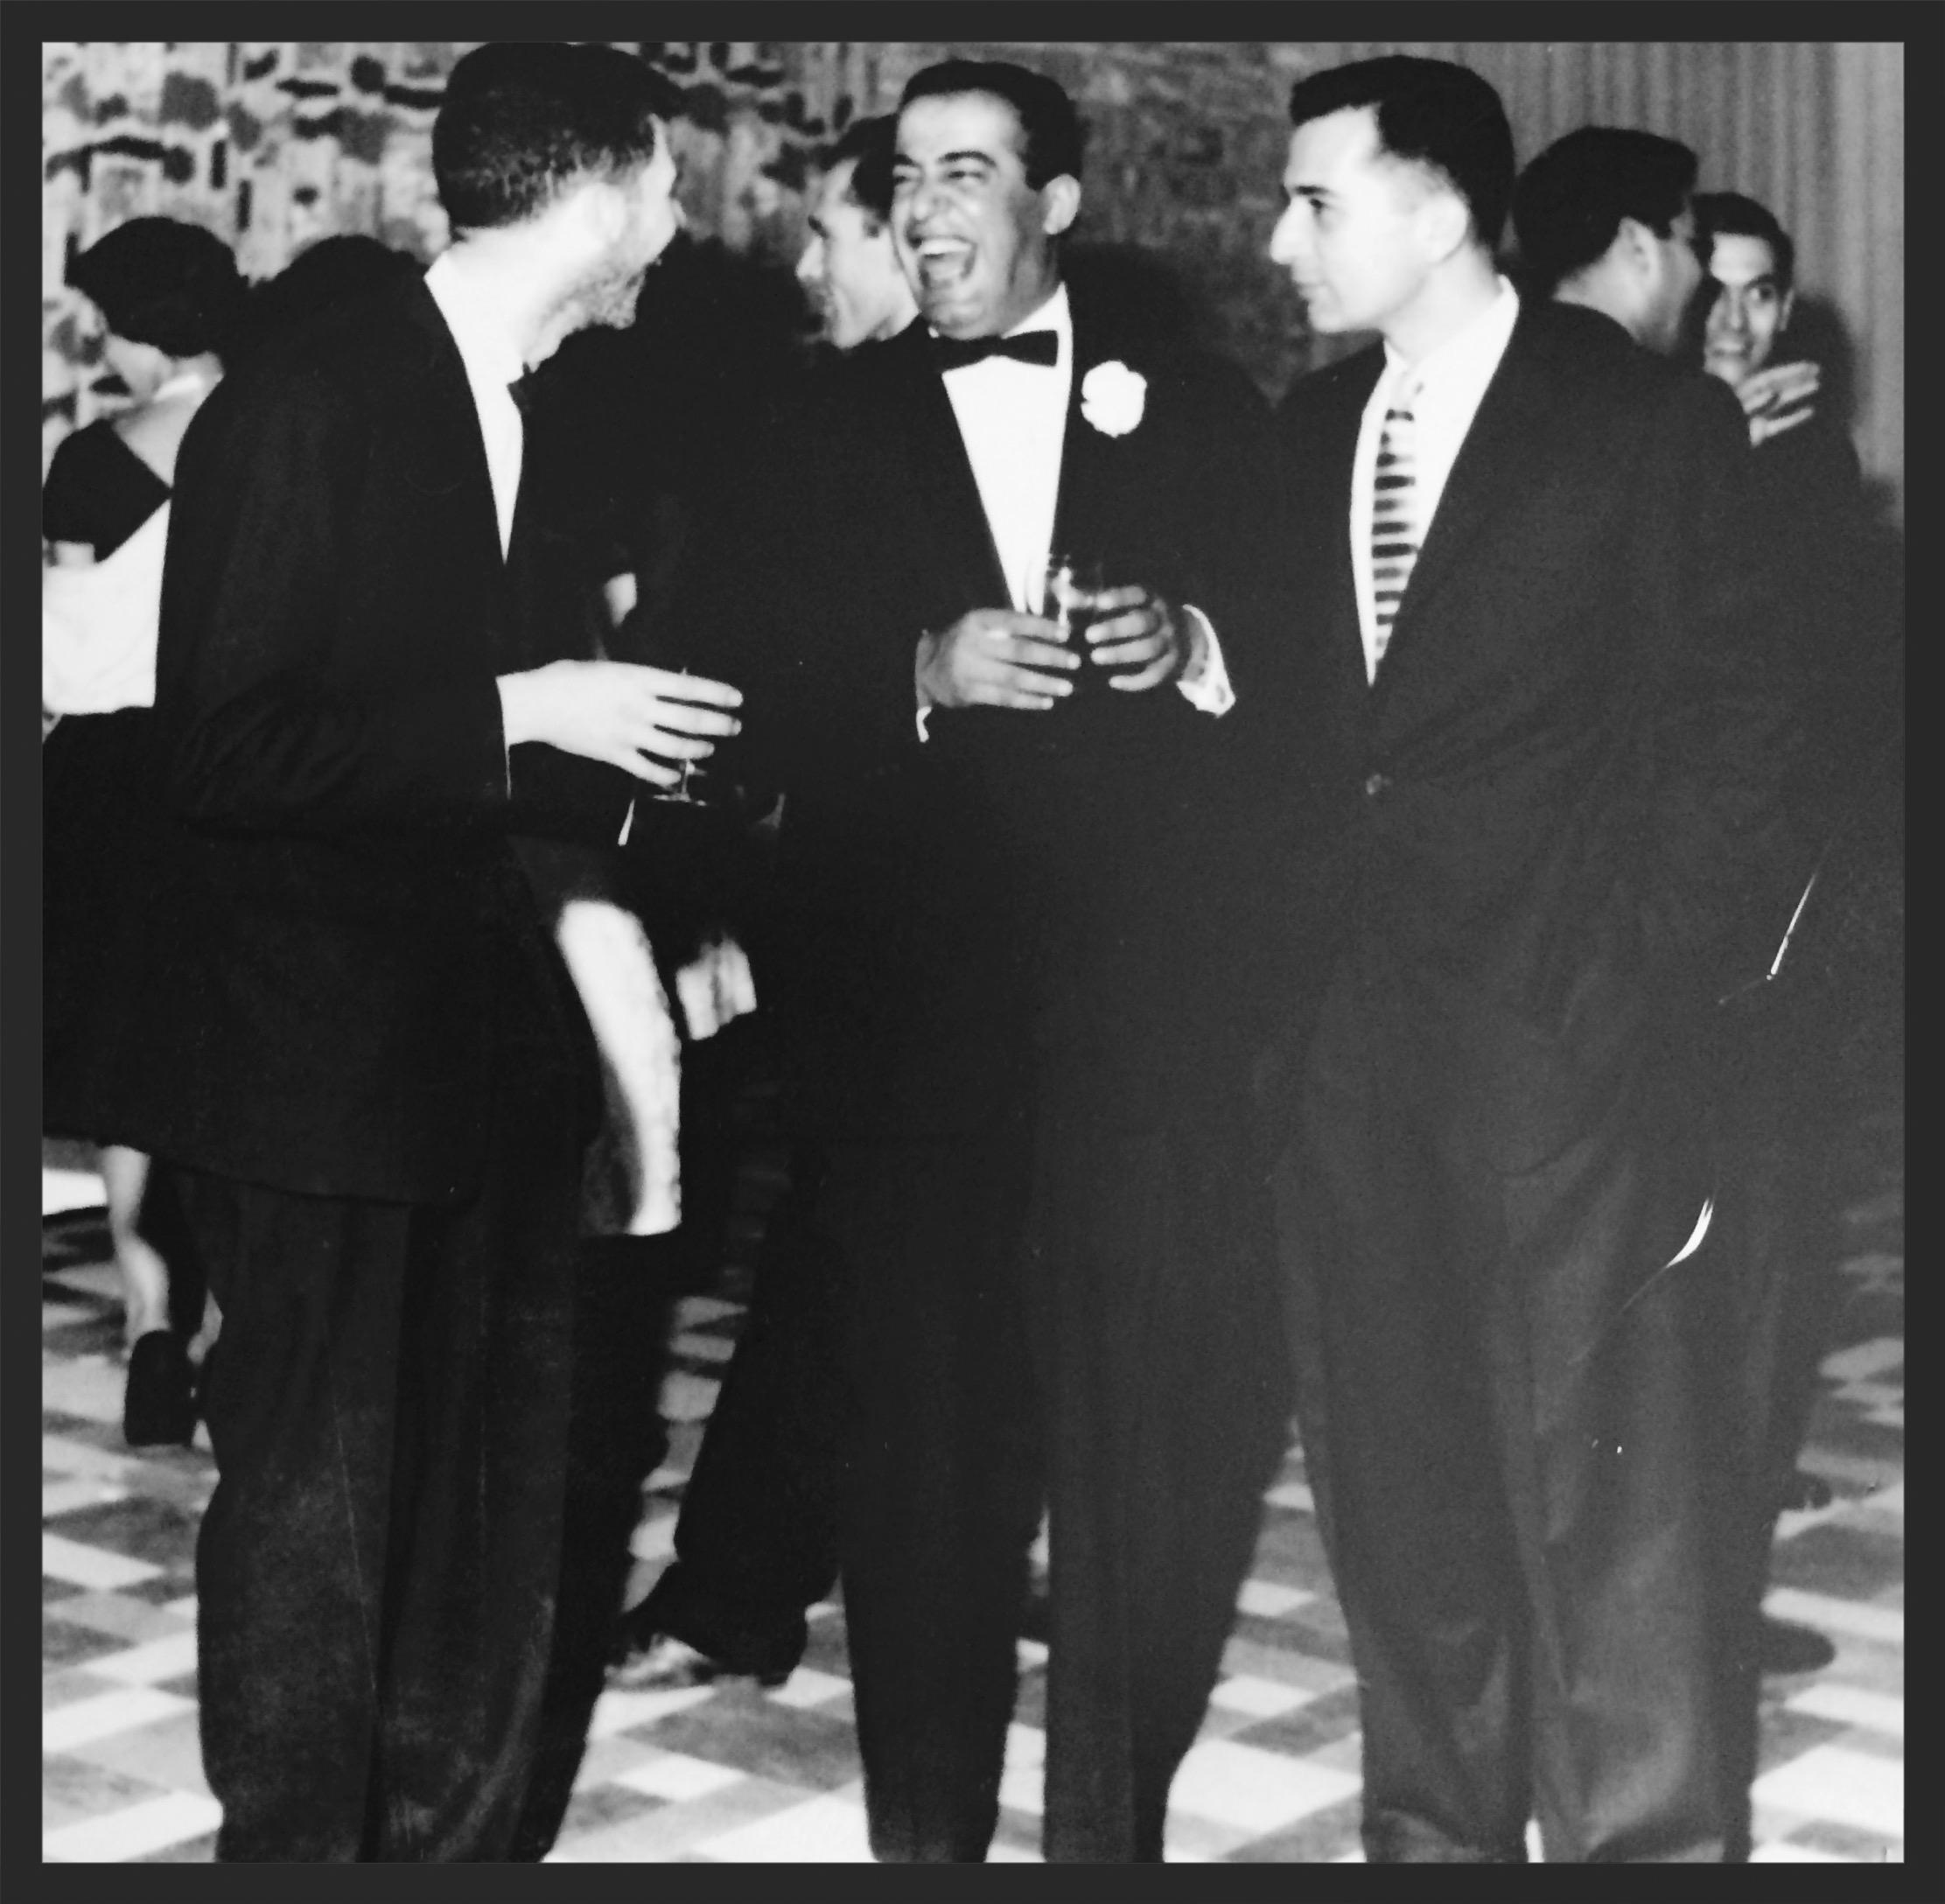 Usama enjoying a laugh with lifelong friends Youssef Al-Shirawi and Kamal Salibi